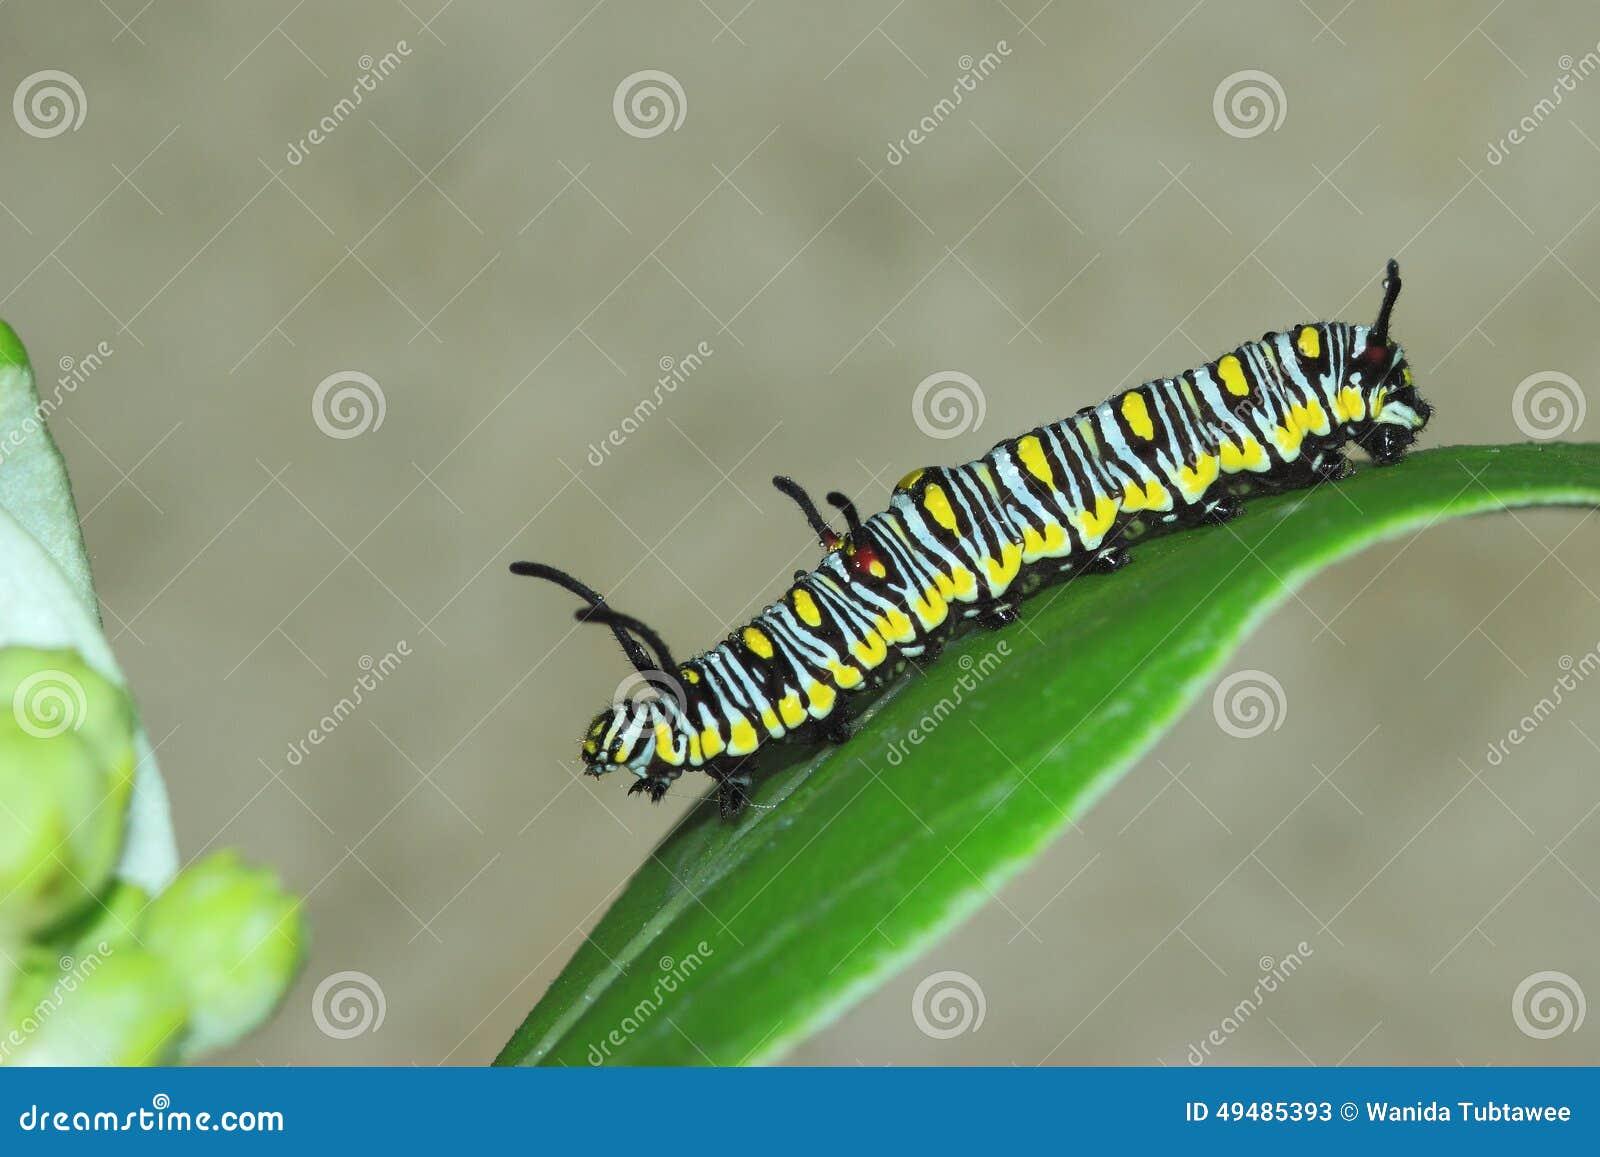 Worm pattern